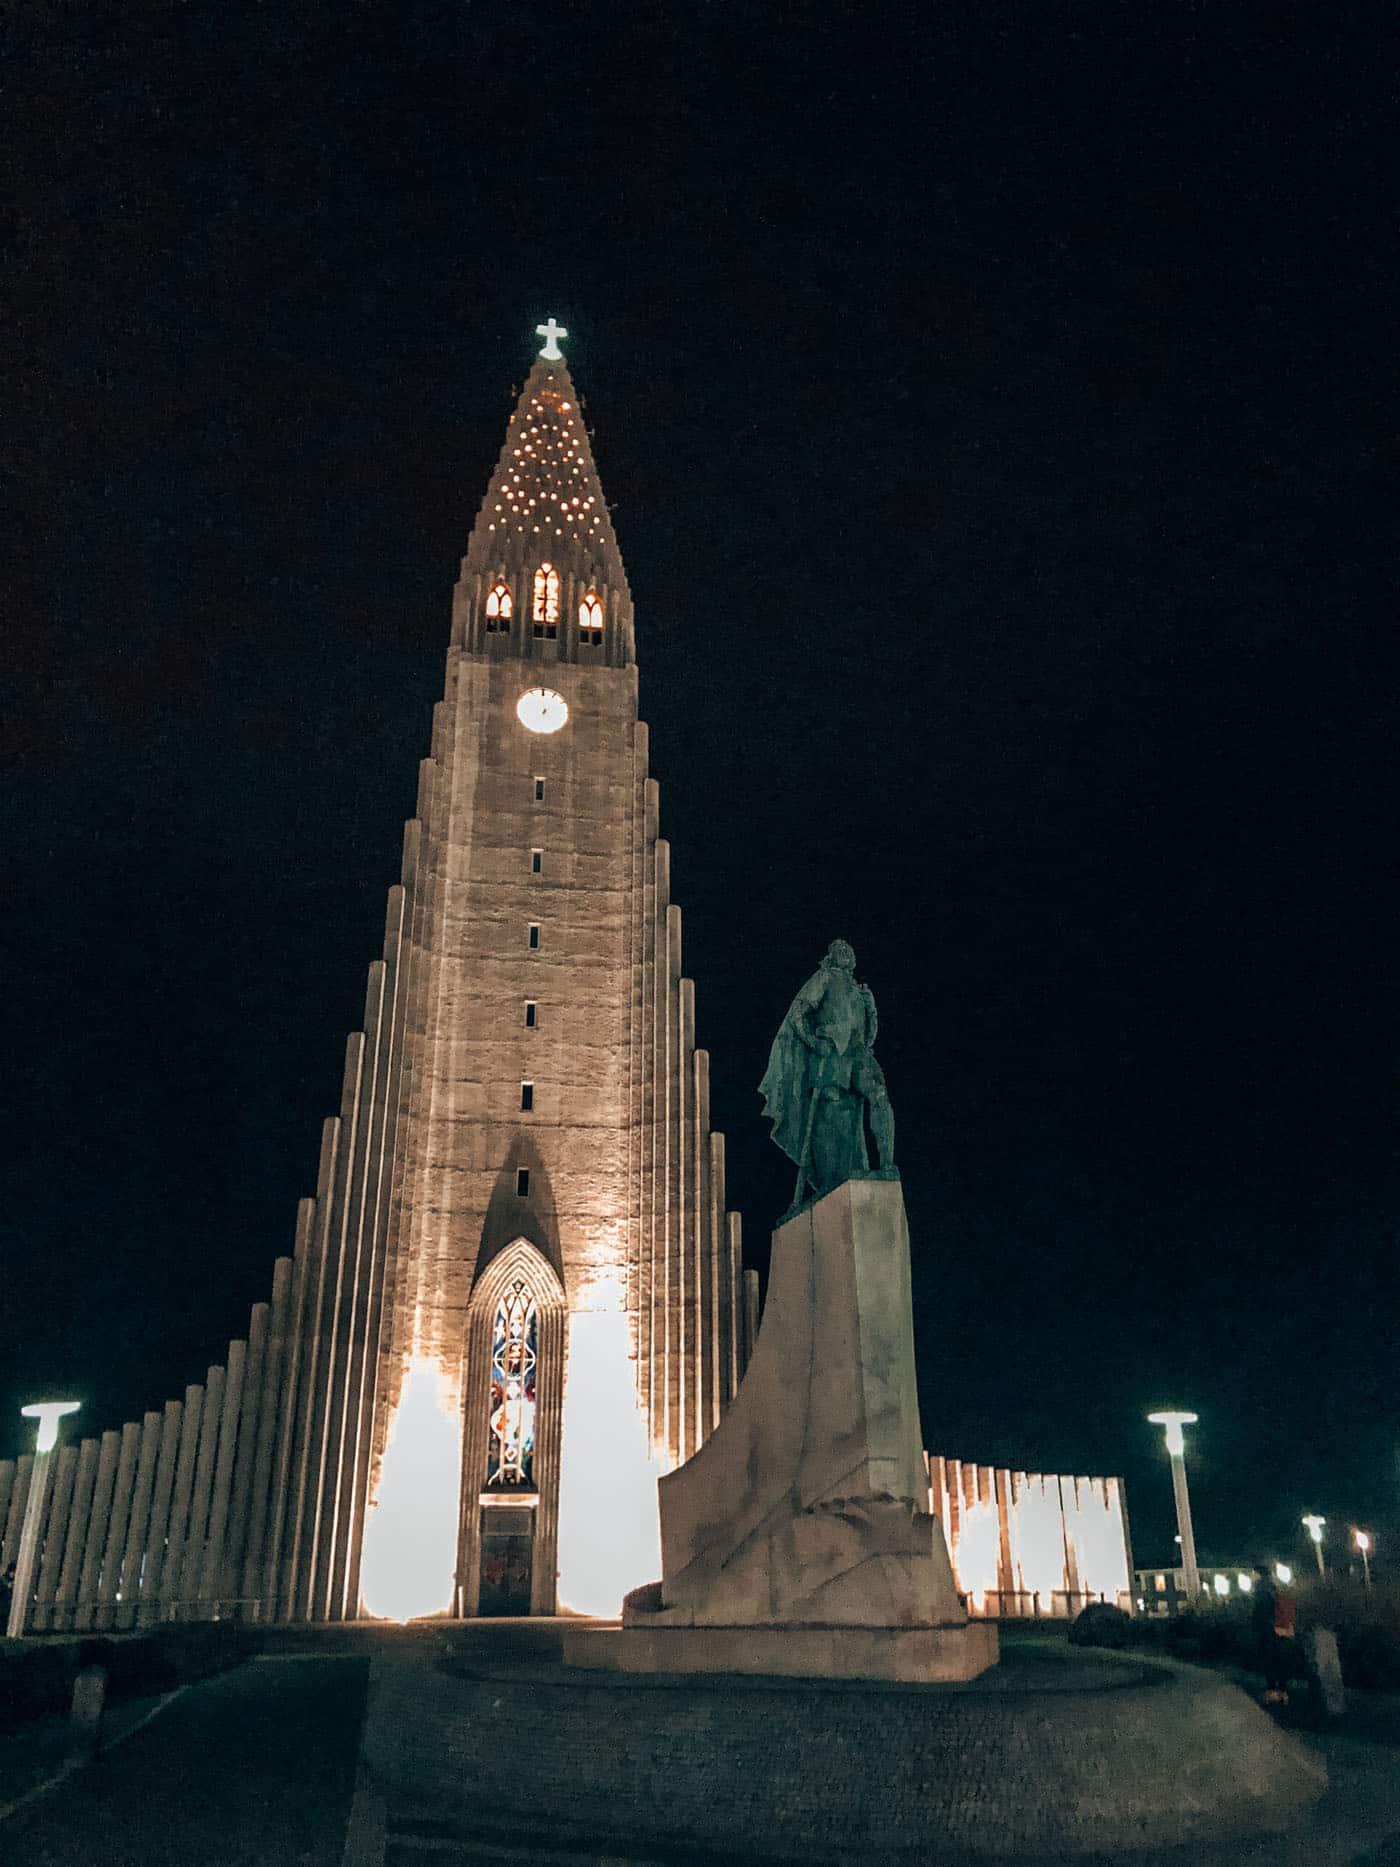 Church at night in Reykjavik